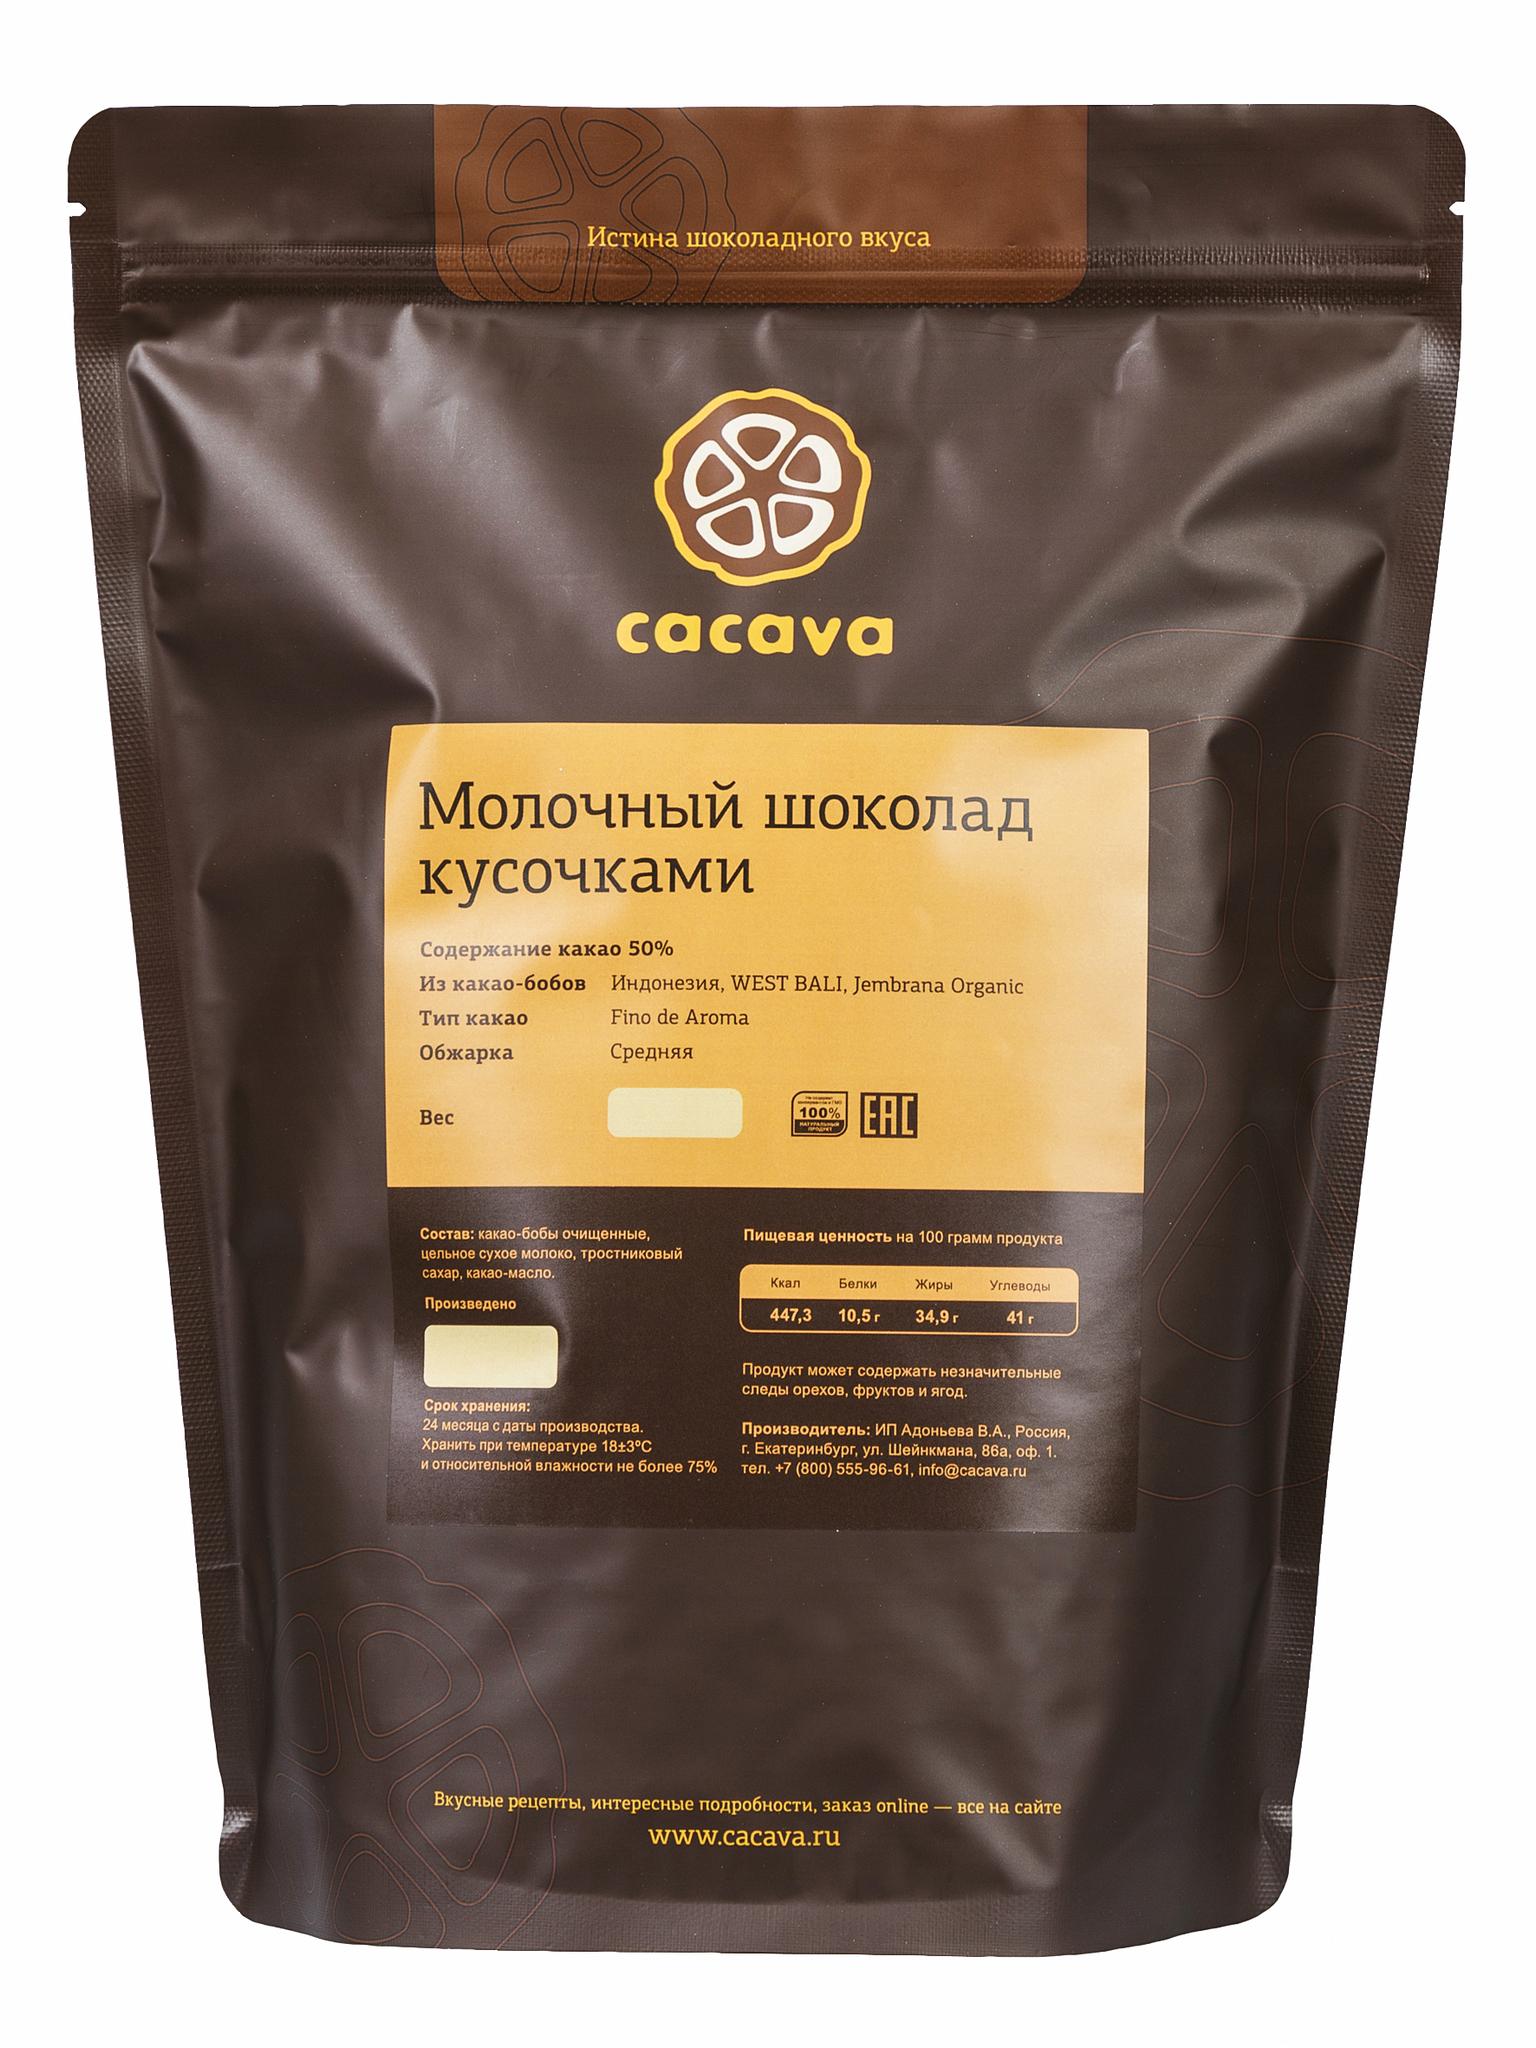 Молочный шоколад 50 % какао (Индонезия, WEST BALI, Jembrana), упаковка 1 кг